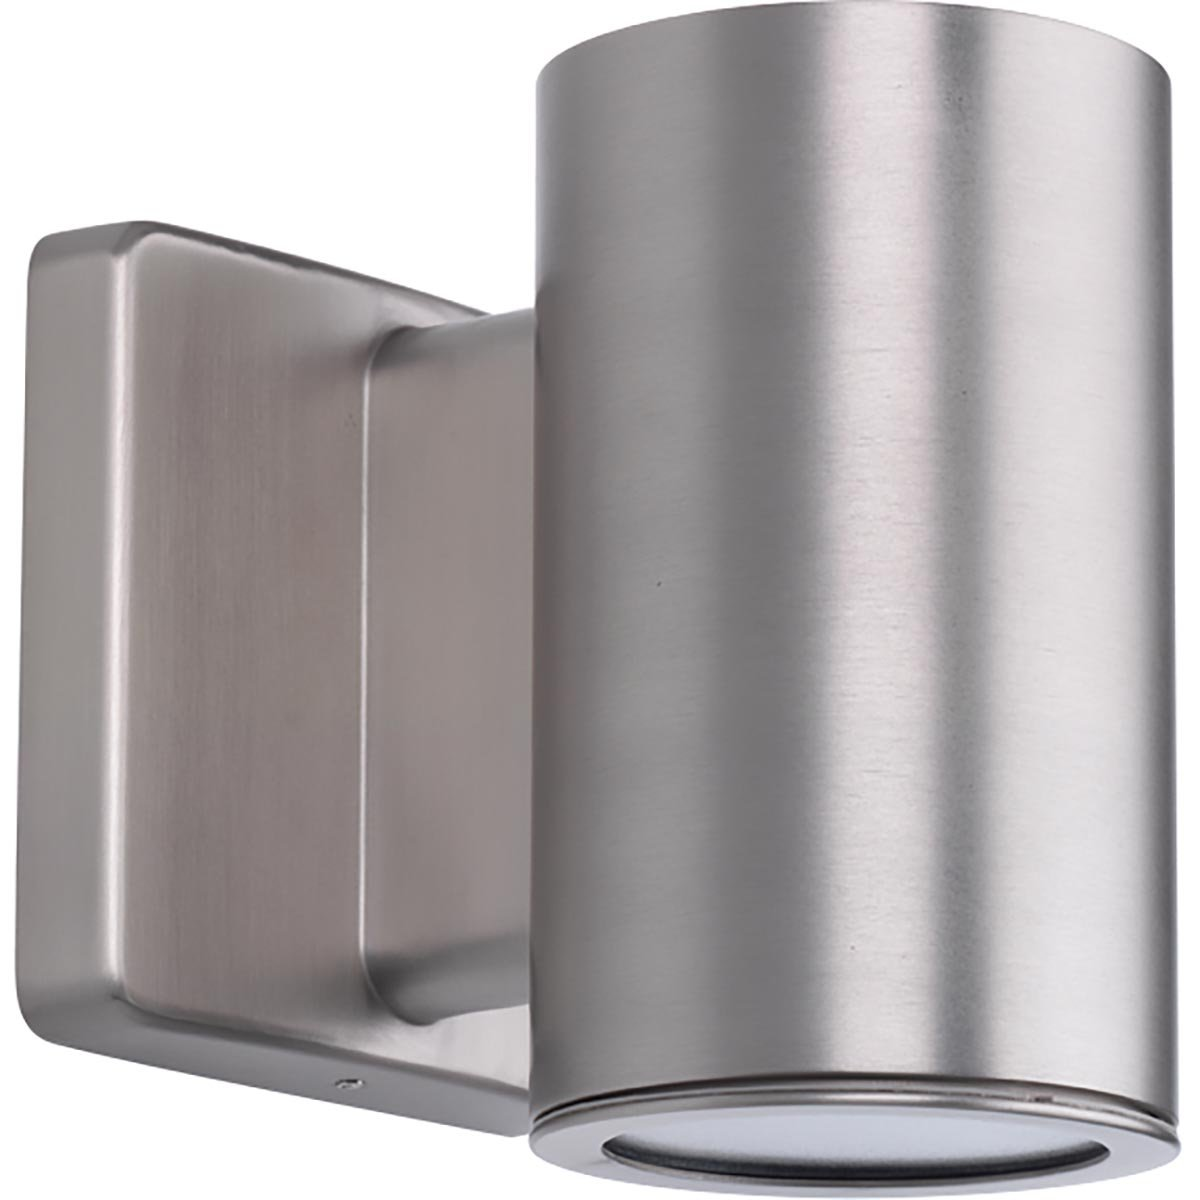 Progress Lighting P563000-147-30K 3IN Cylinders Wall Lantern, Grey